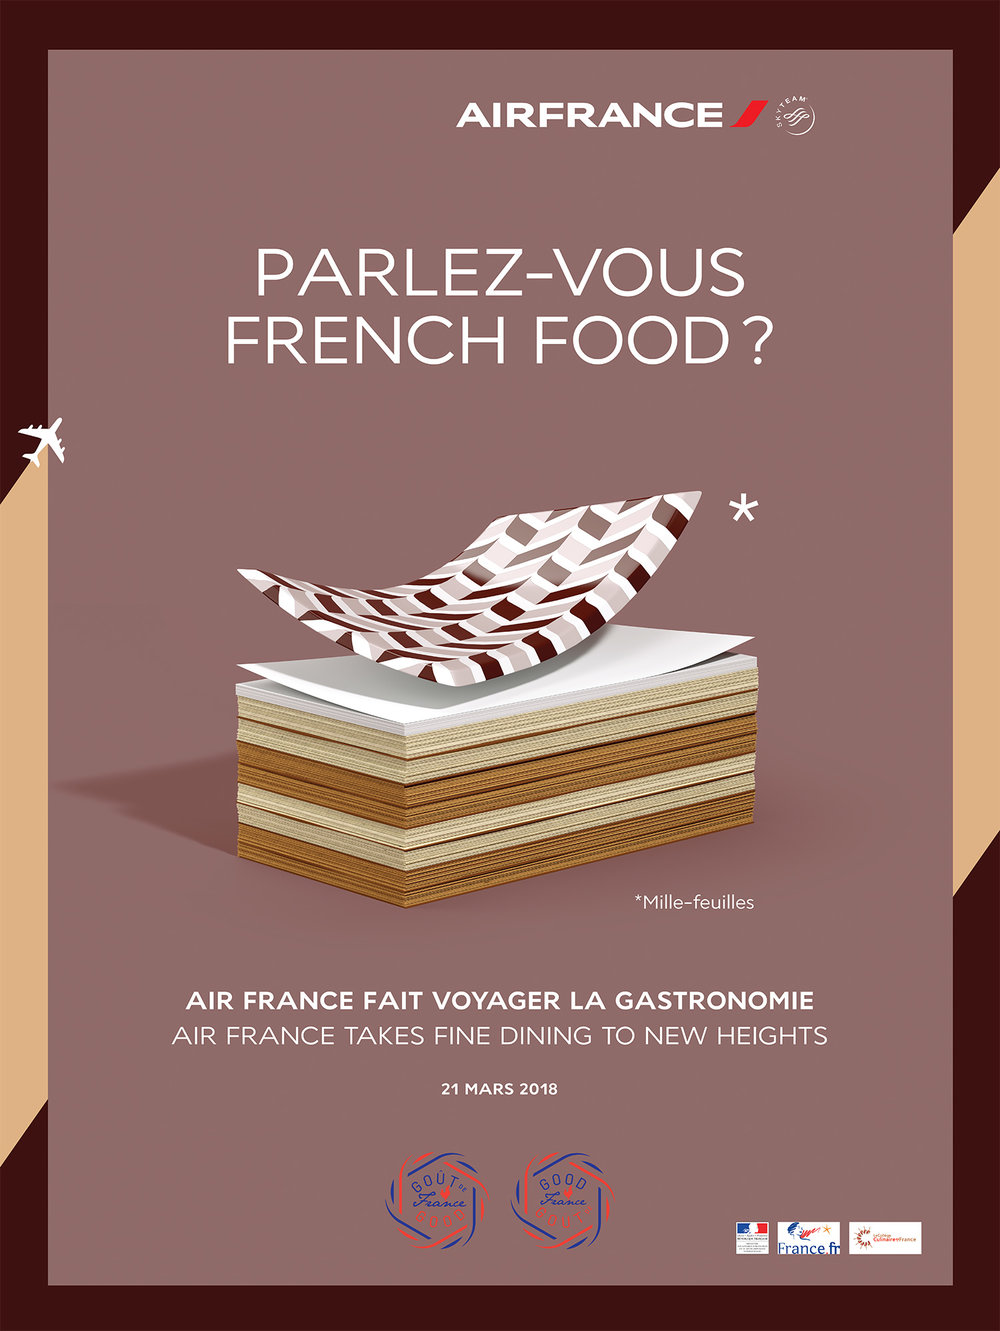 Gout+de+France+2018.jpg